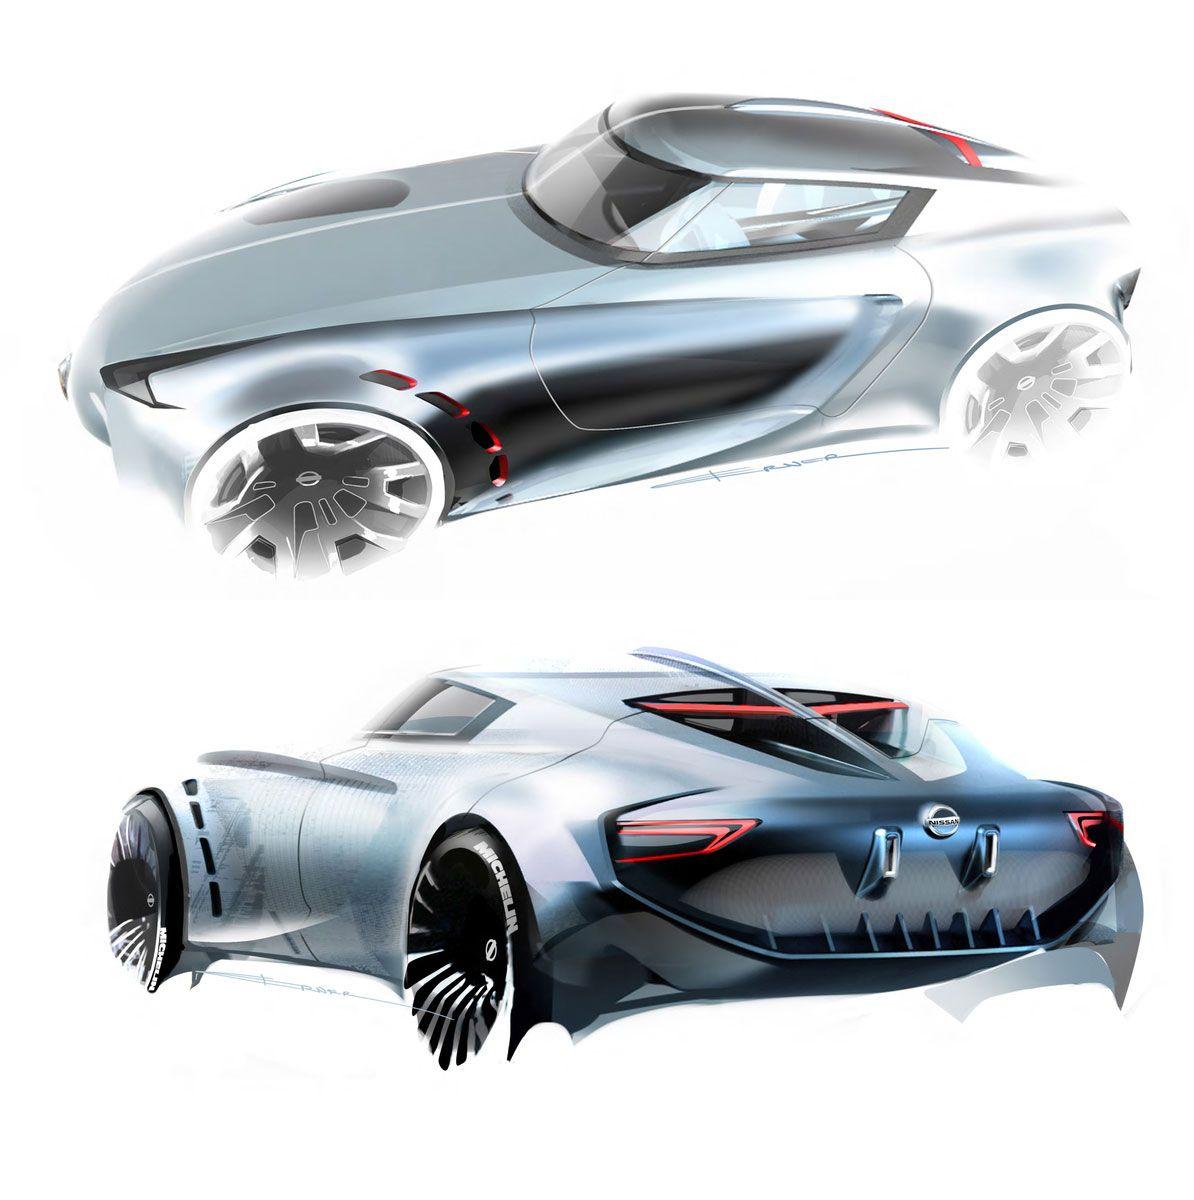 Nissan Z Concept Design Sketches By Berk Erner From Art